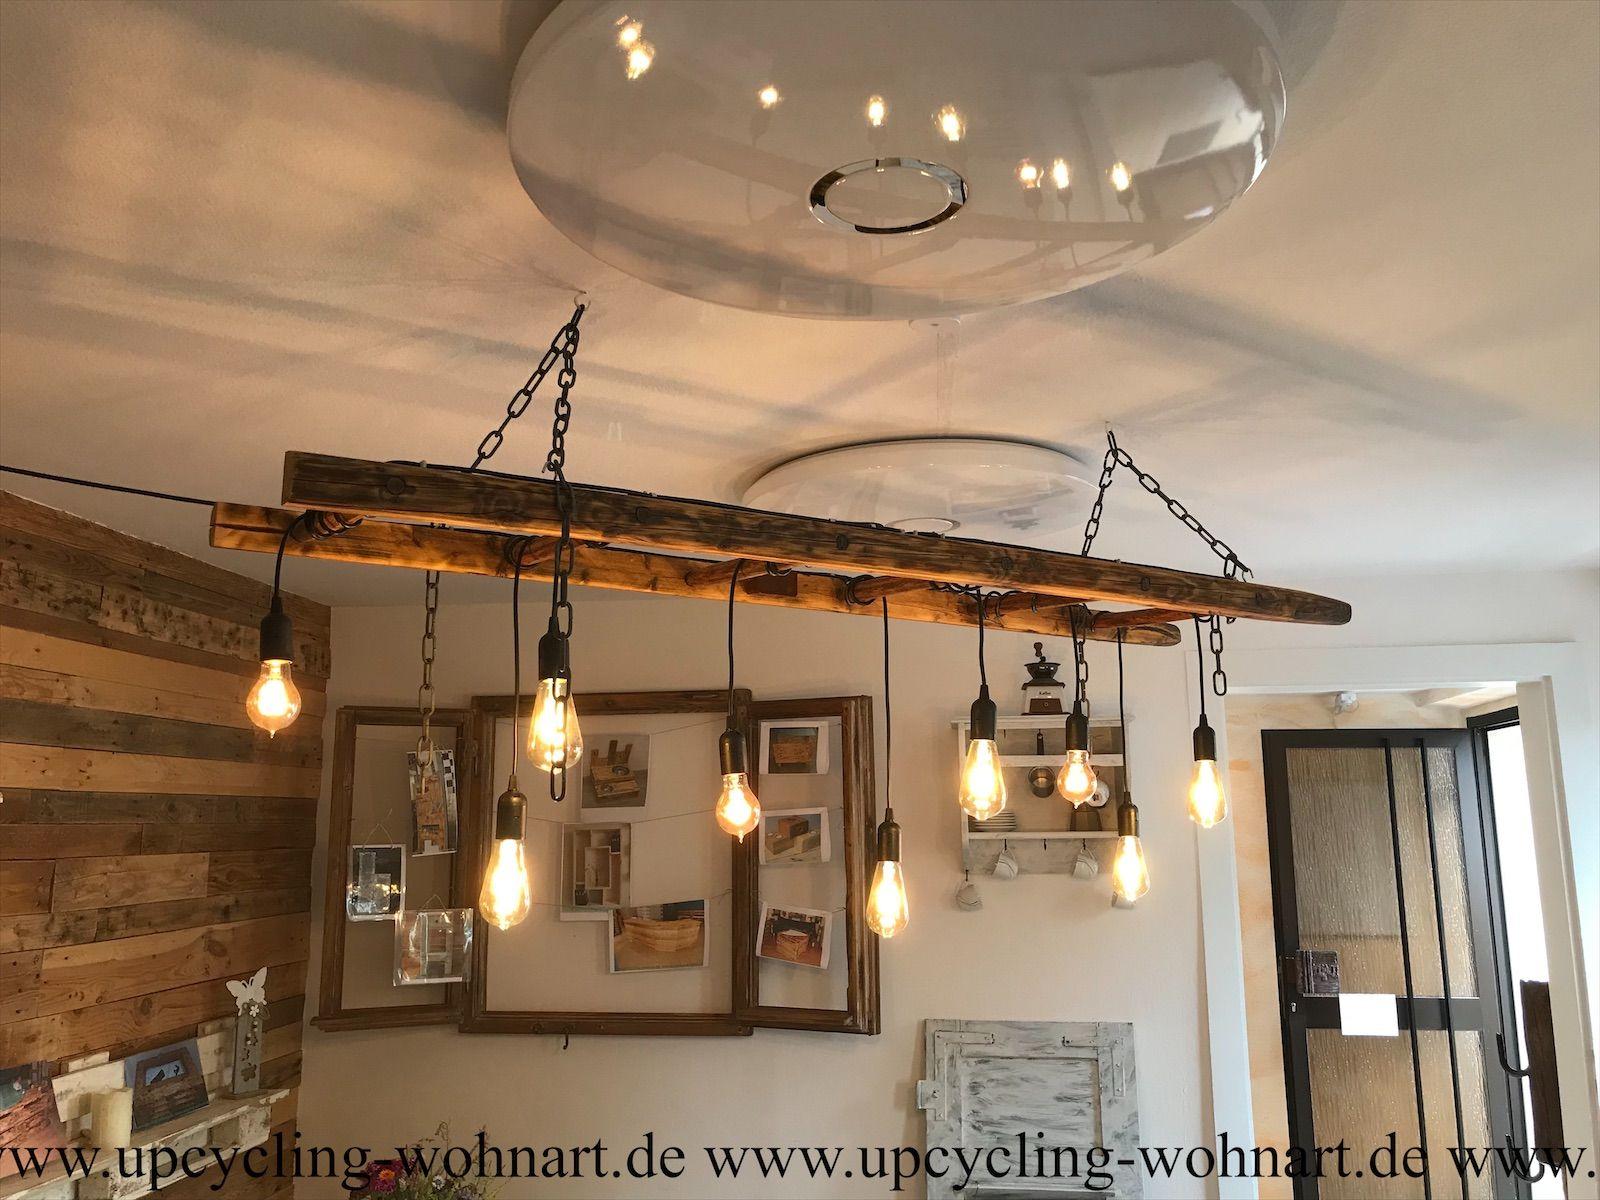 Pendelleuchte, Upcycling Leiterlampe